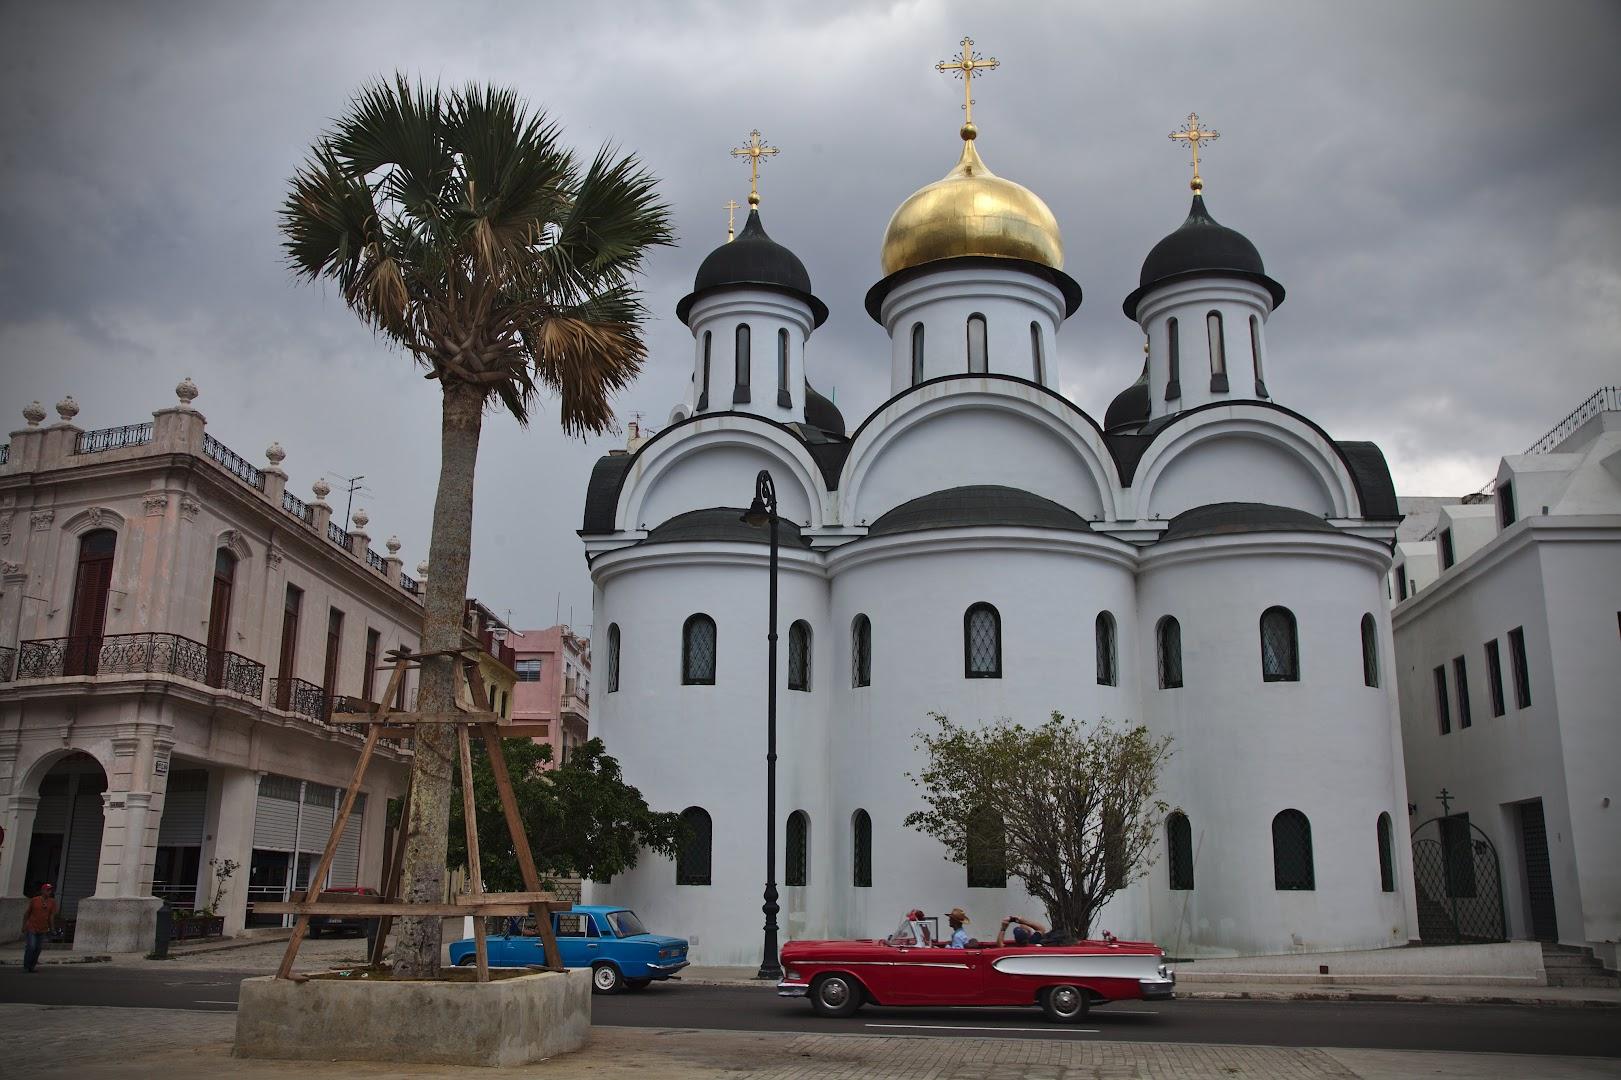 Orhodox church survived the revolution